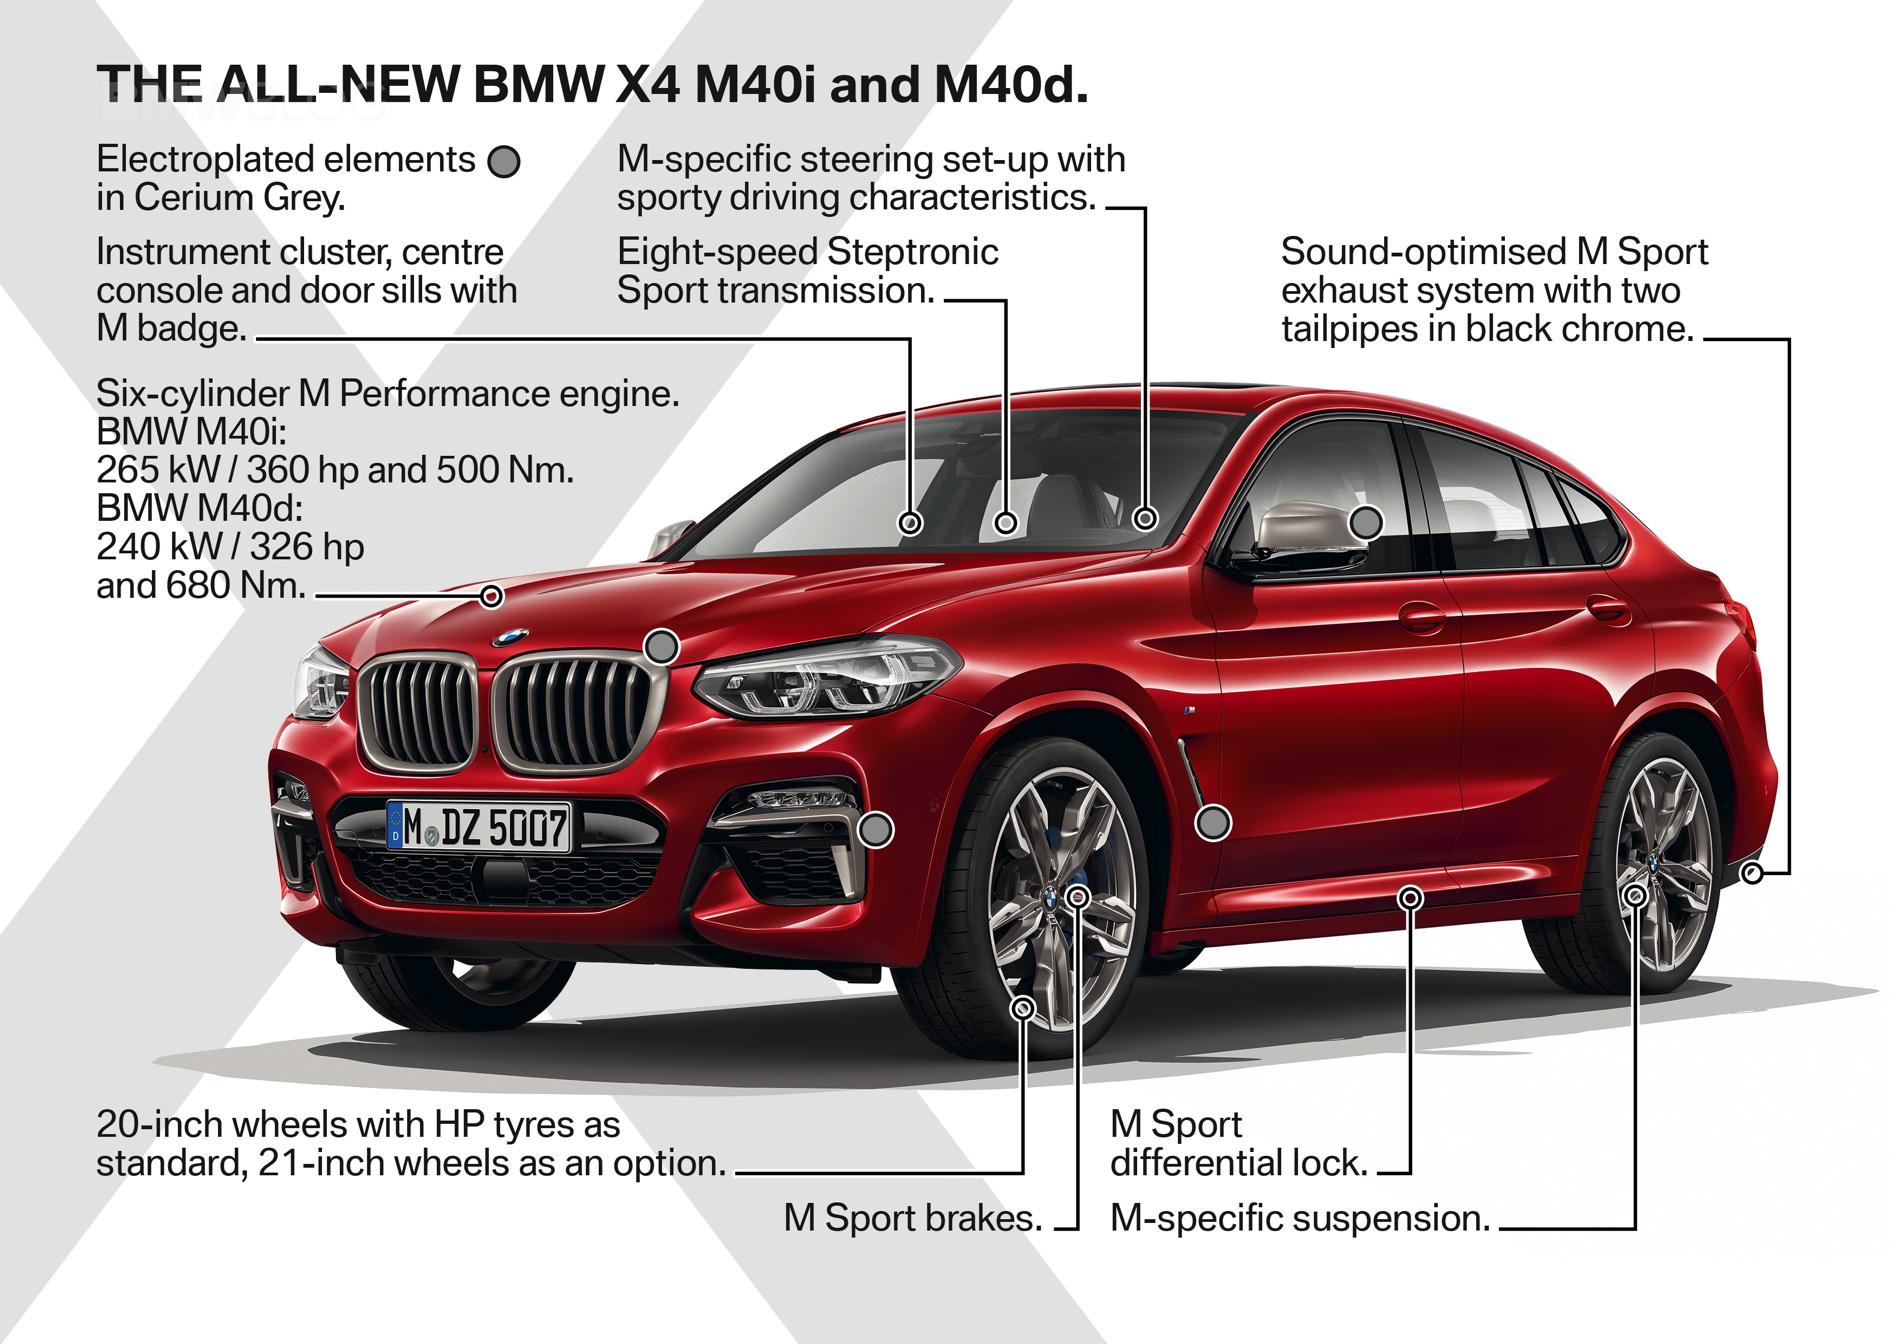 New 2018 BMW X4 M40d exterior design 55